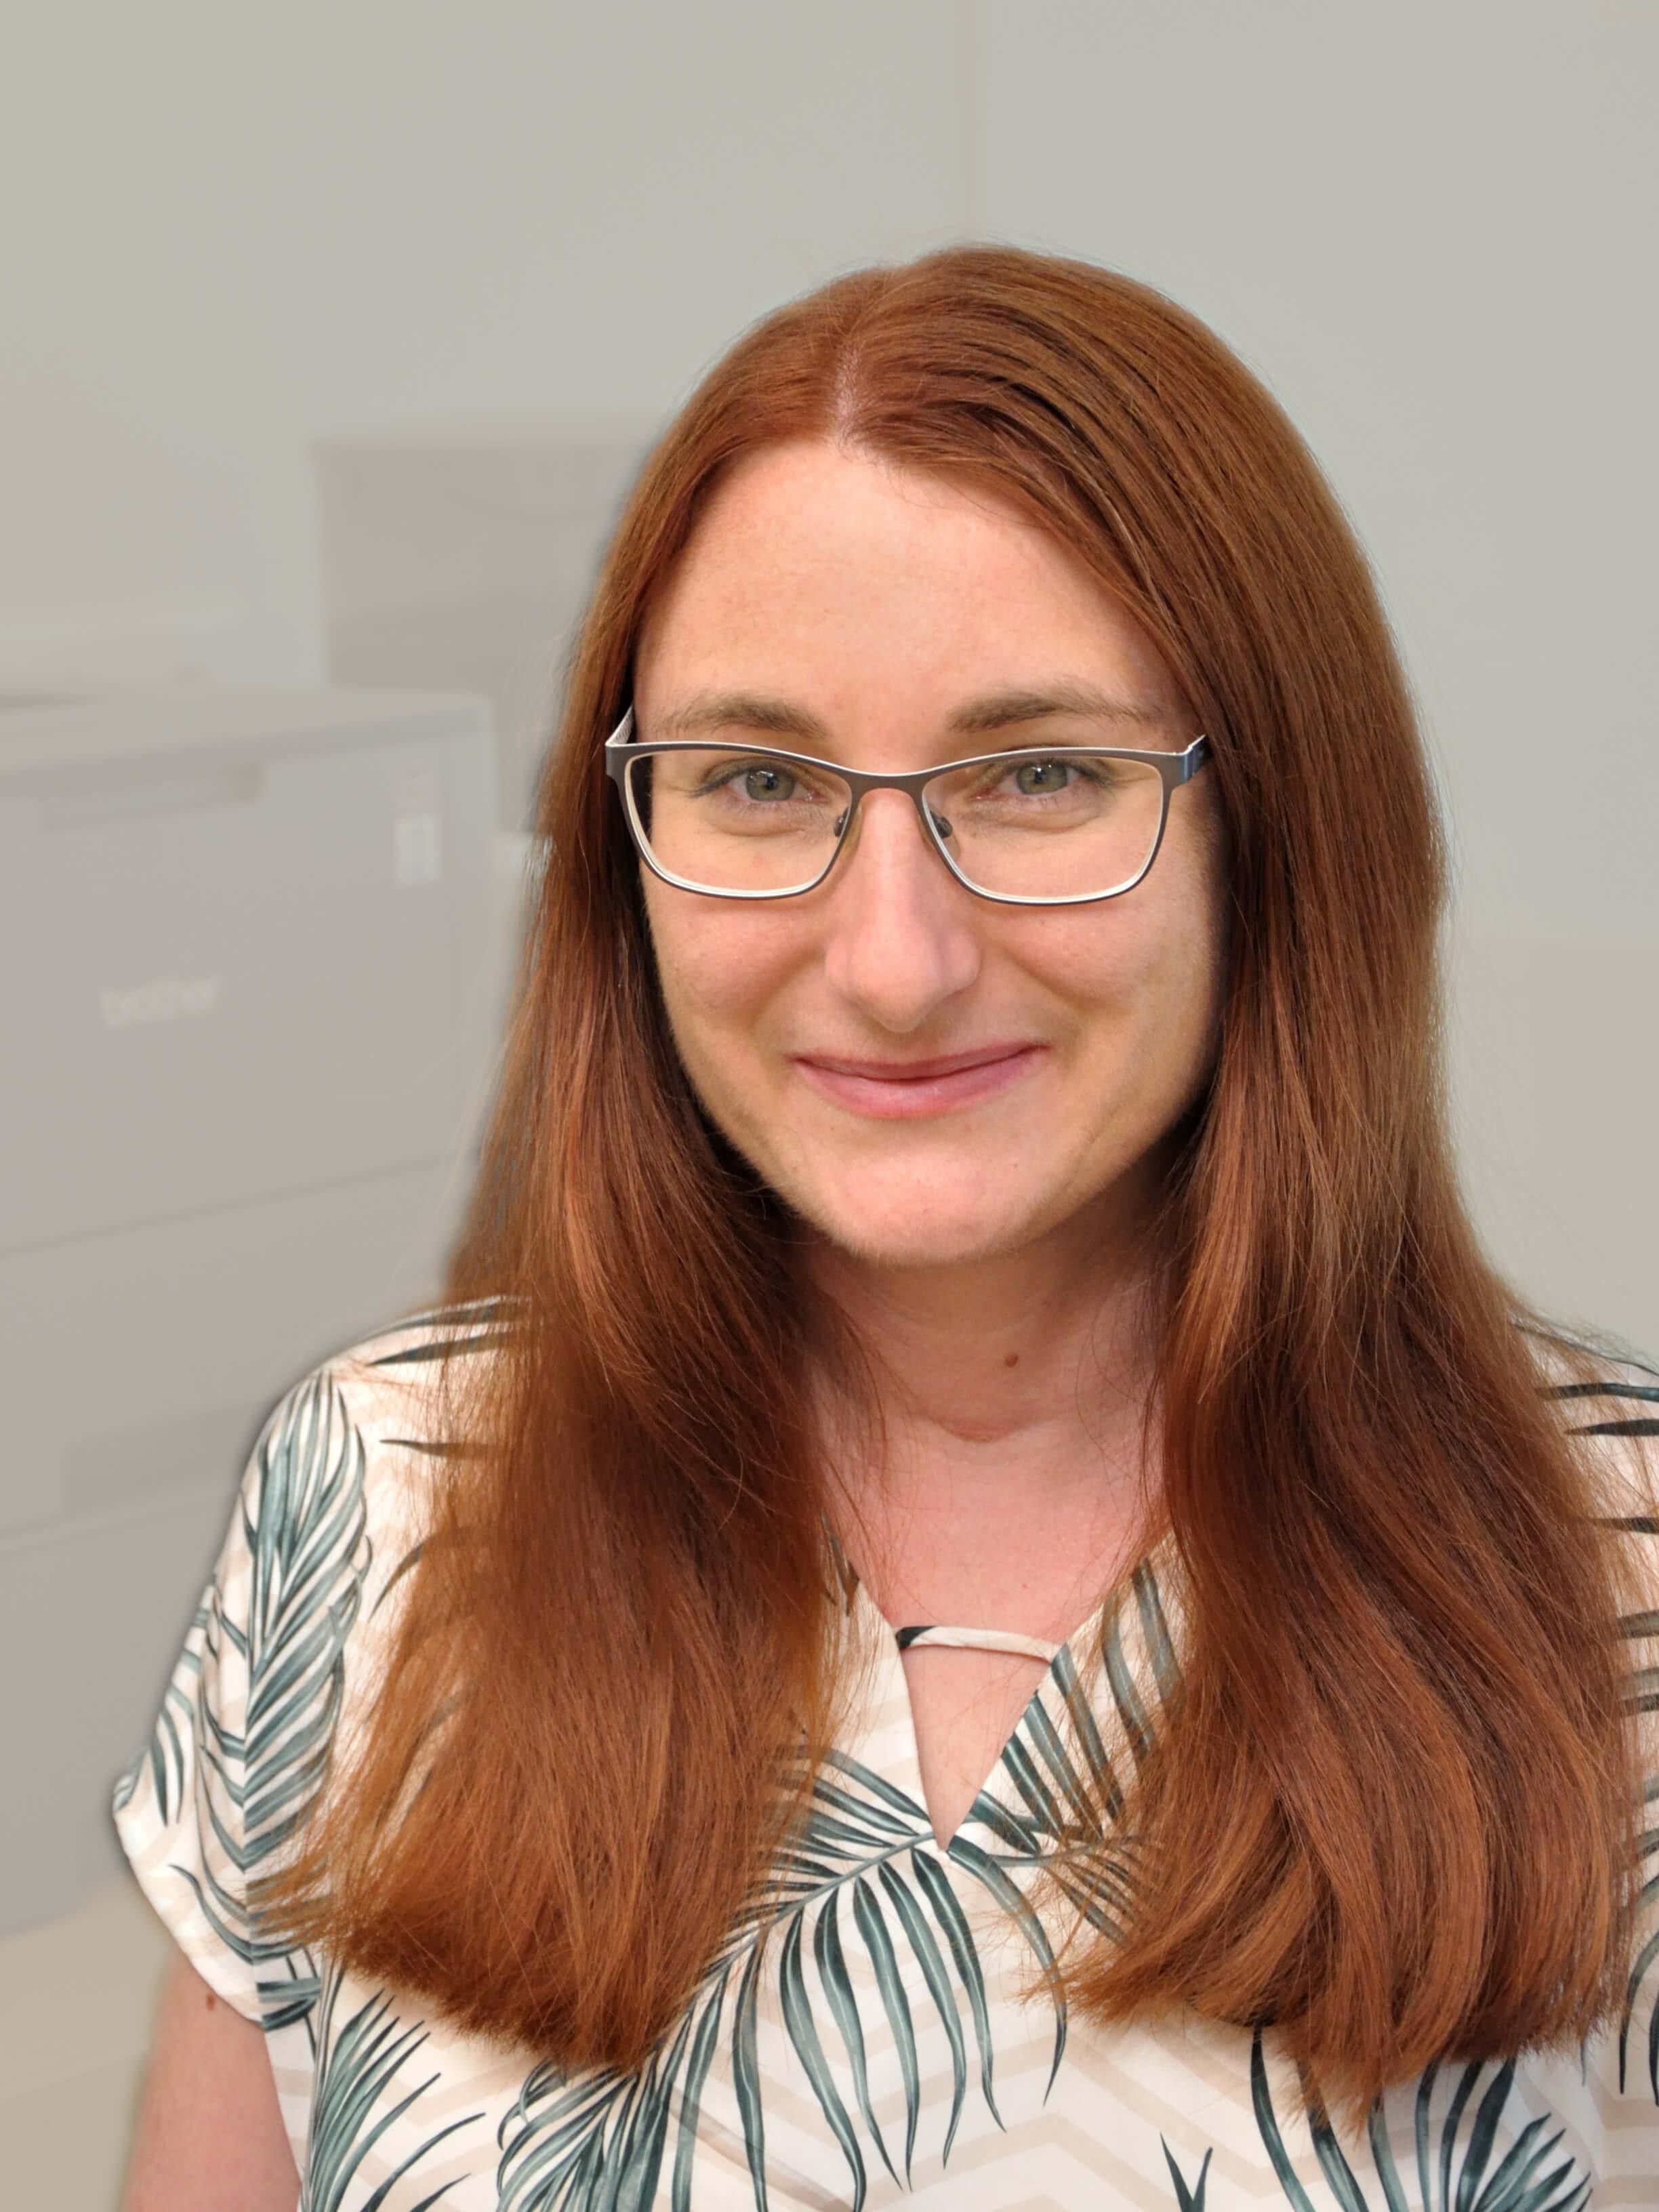 Dr. Nora Santer